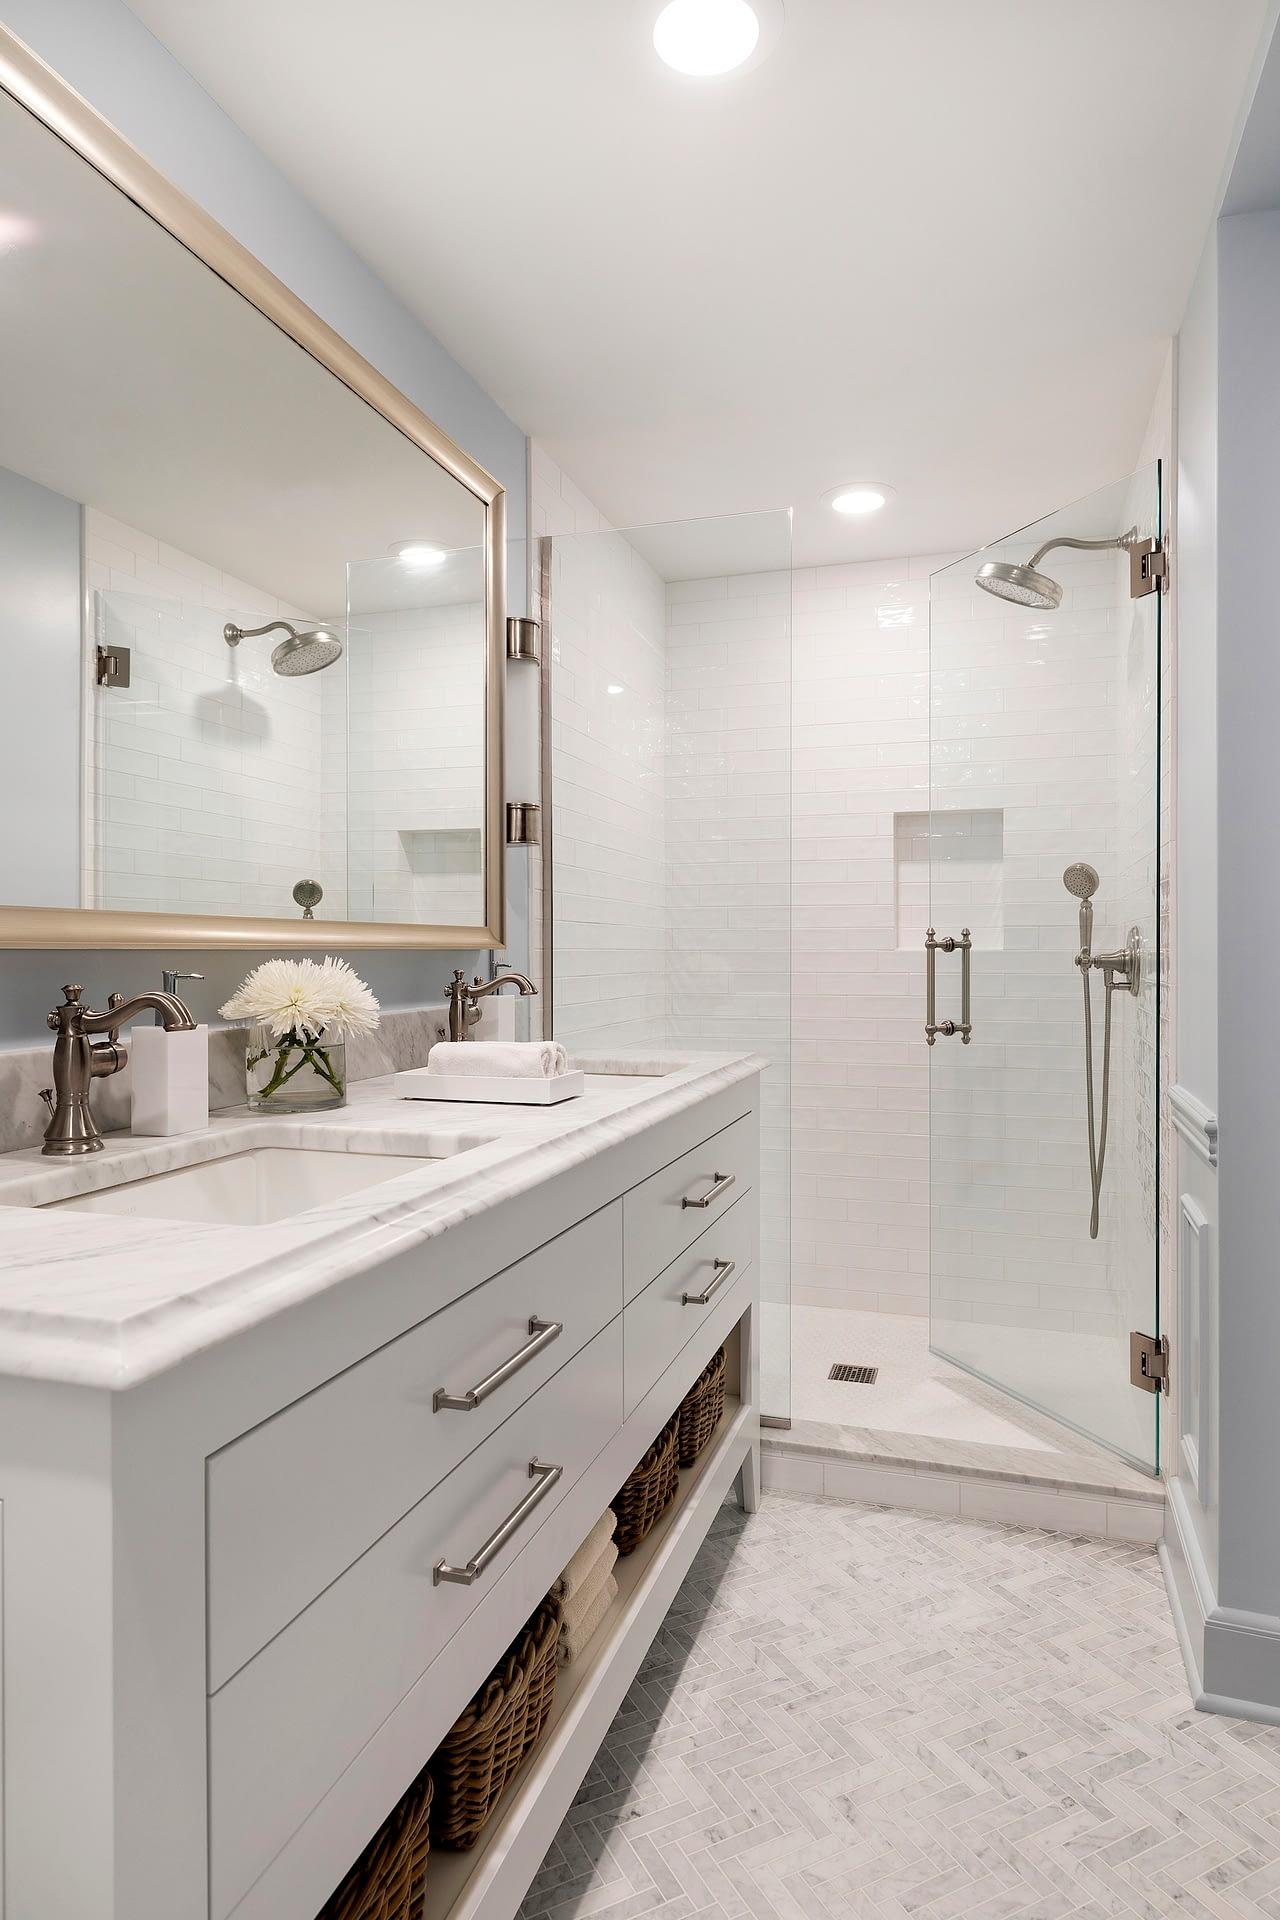 Leigh Hull Designs - Minneapolis Interior Designer - Project: lake-harriet-lower-level